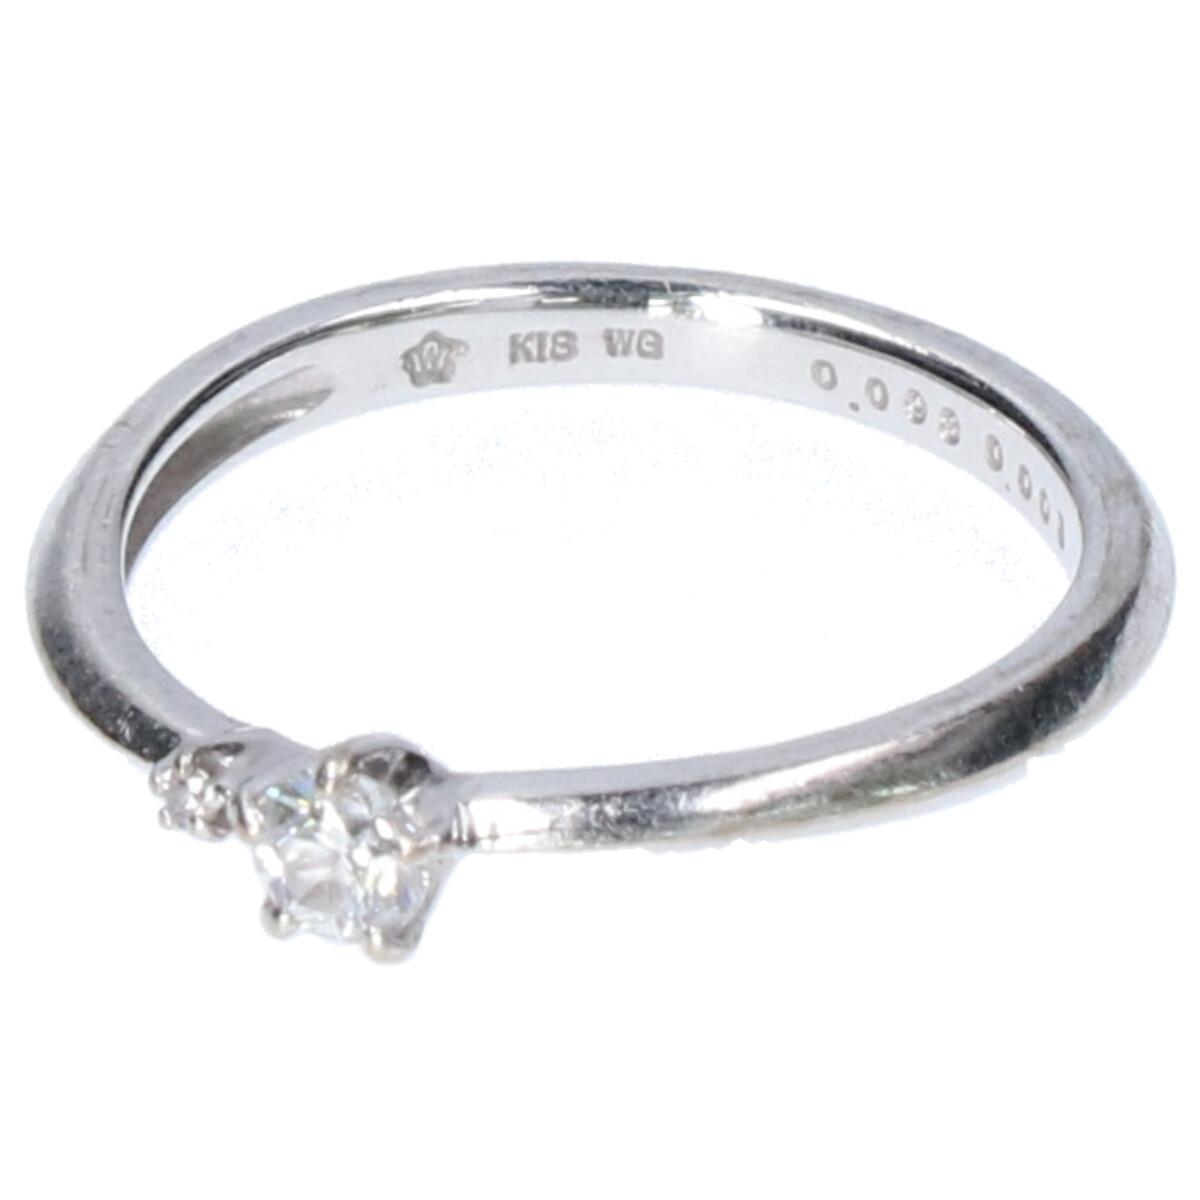 festaria bijou SOPHIA フェスタリアビジュソフィア WISH UPON A STAR K18WG ダイヤモンド0.093/0.005ct リング 指輪 4号 ホワイトゴールド レディース 【中古】